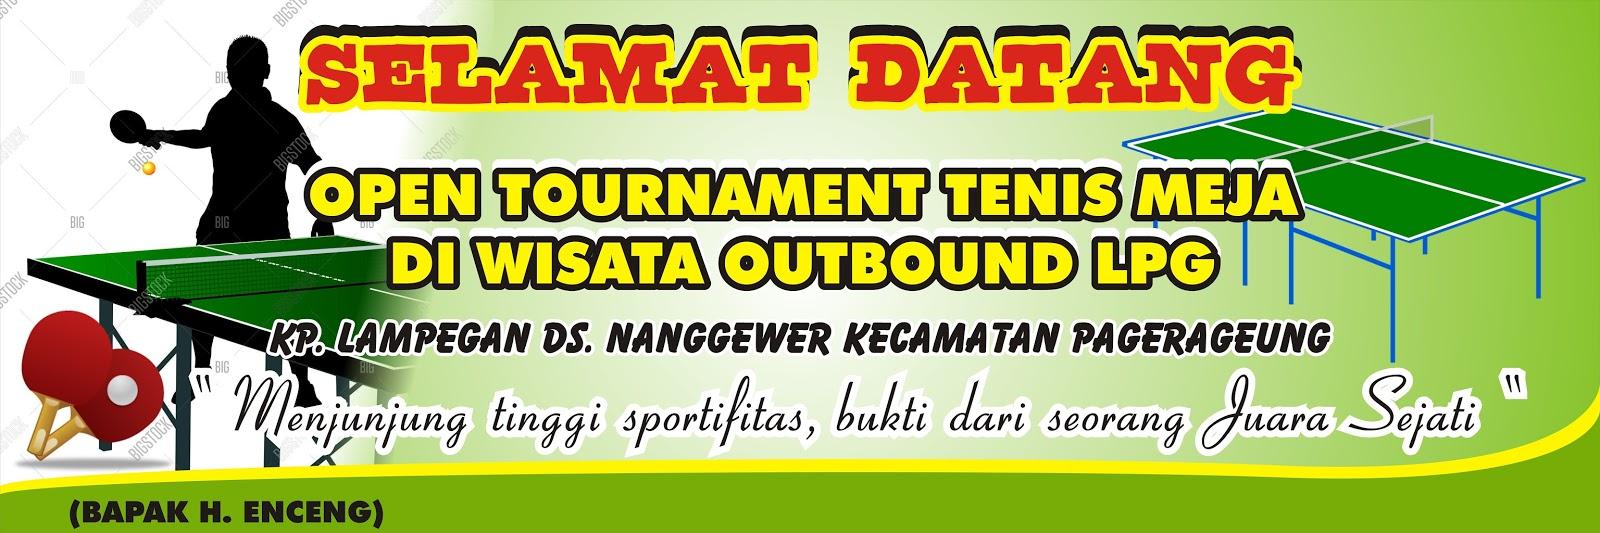 Spanduk Kegiatan Lomba Olahraga Tenis Meja Cdr